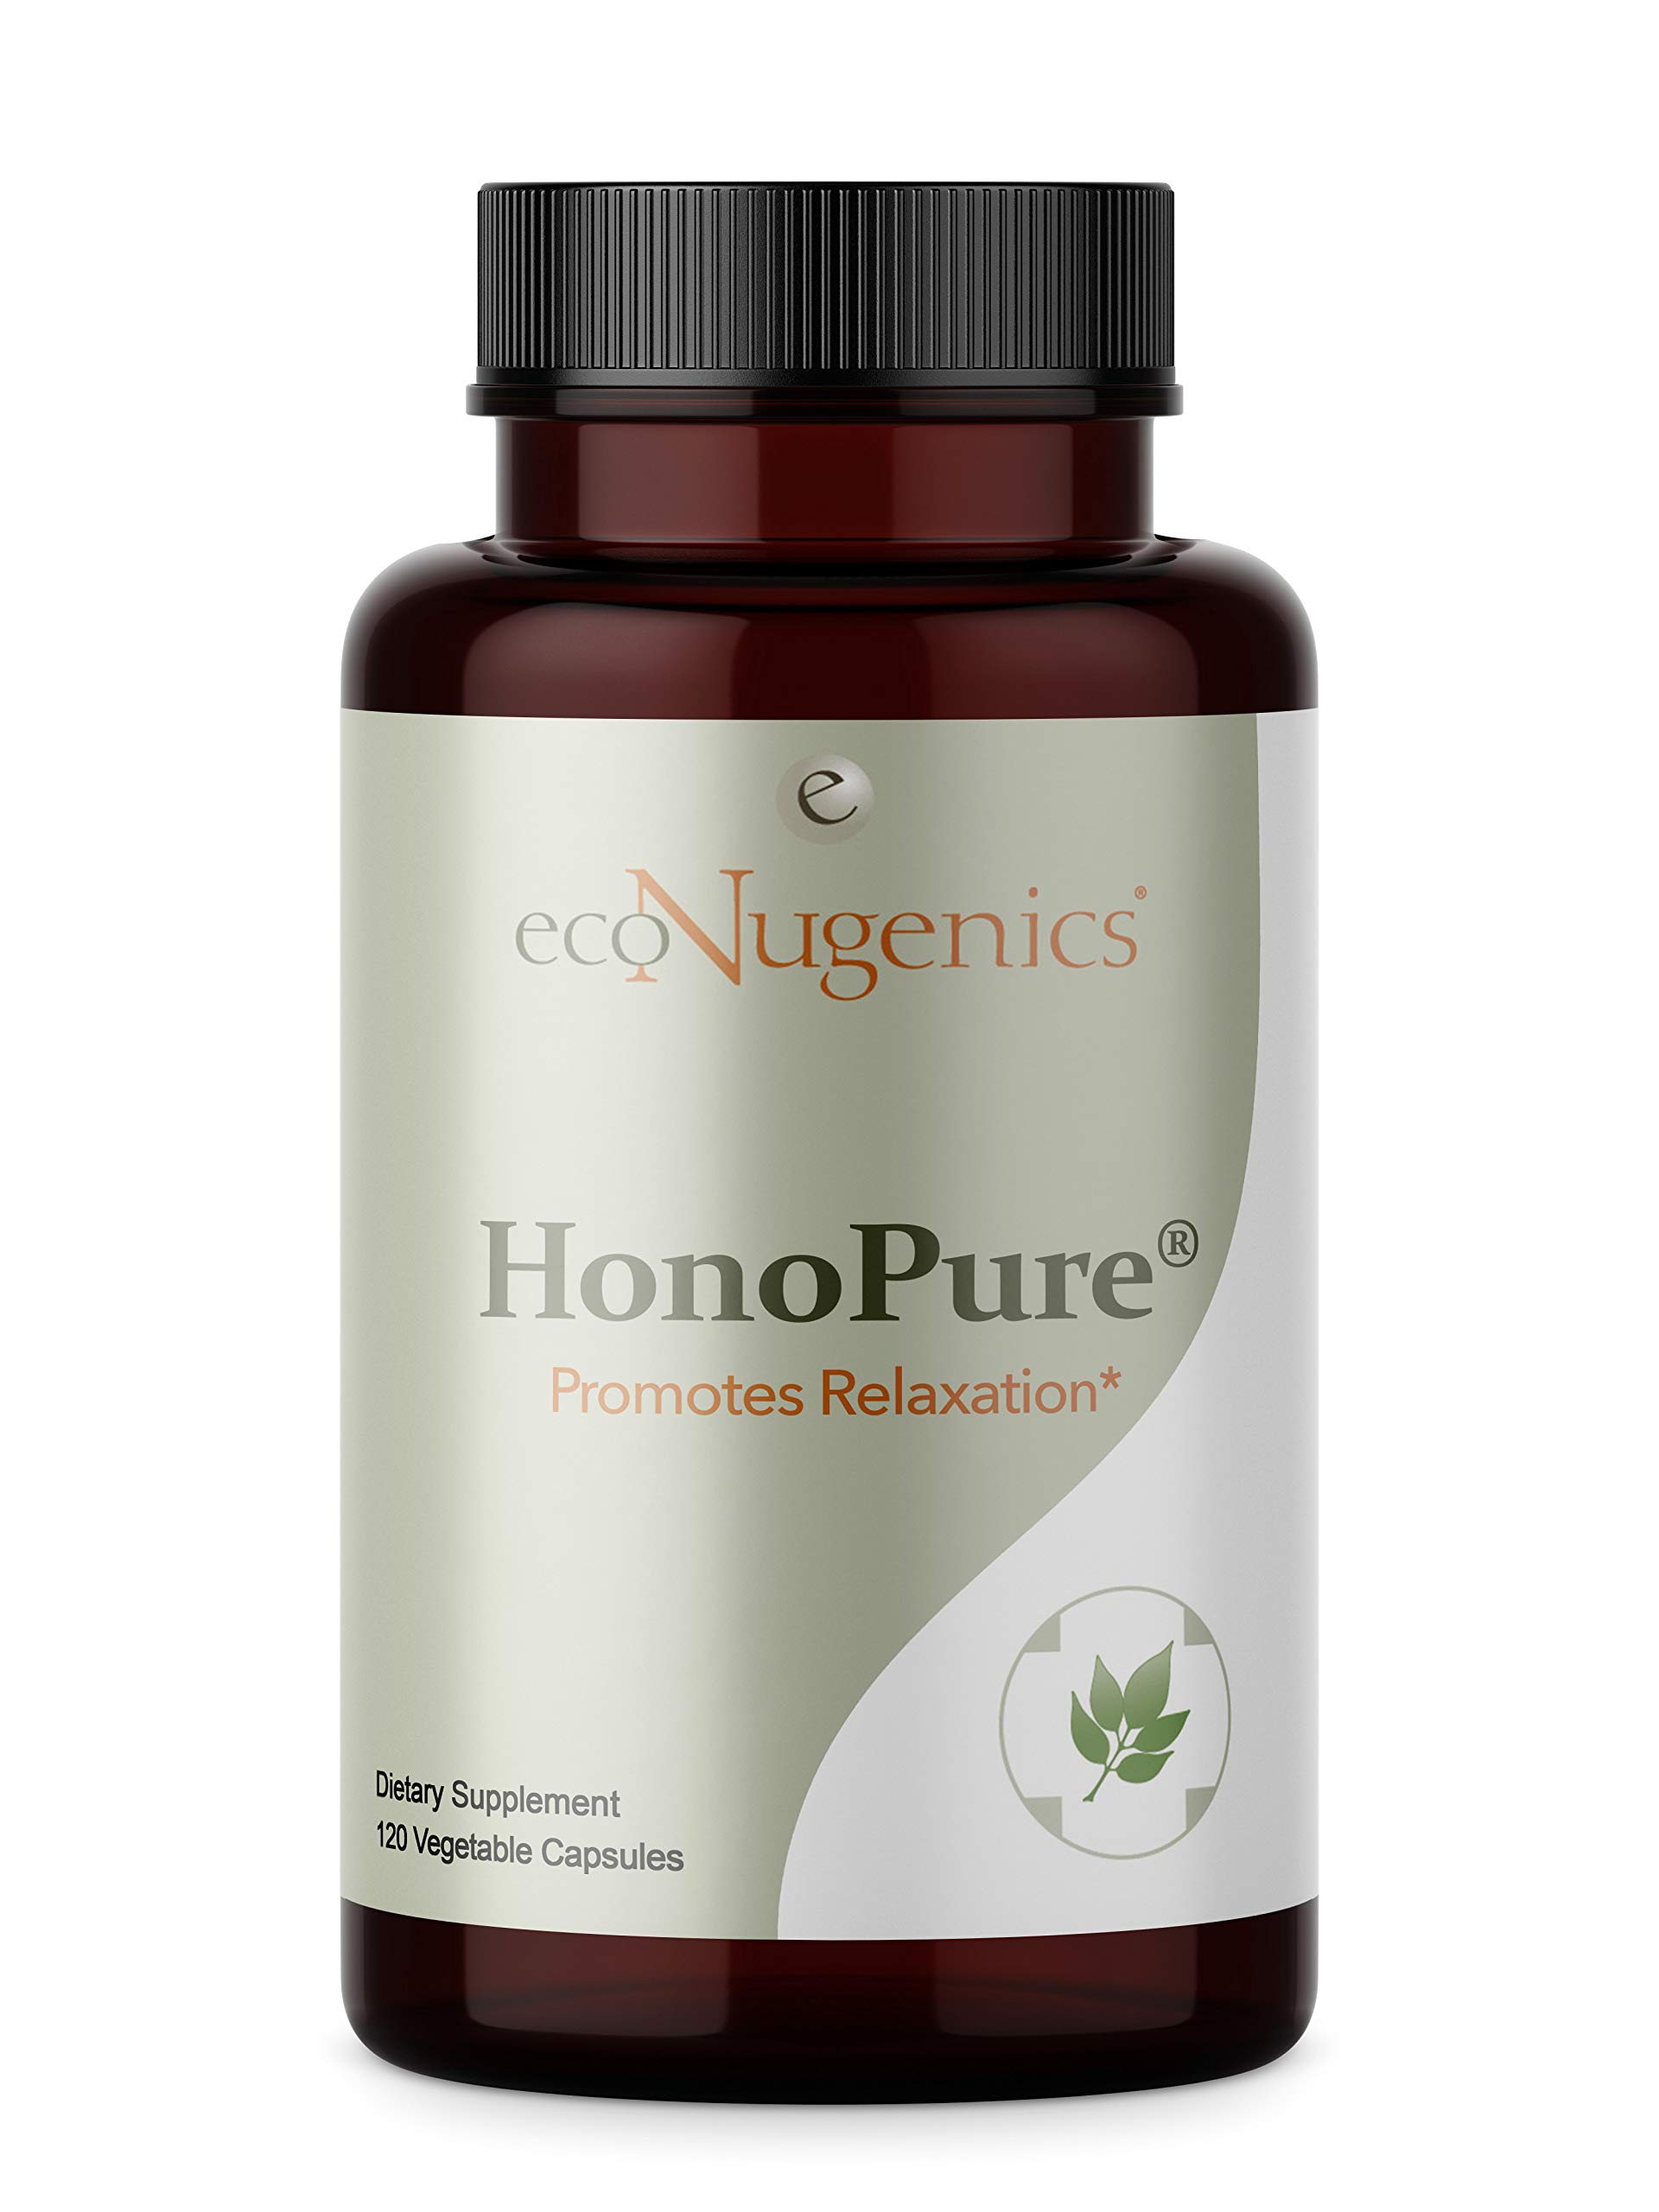 Econugenics Honopure 120caps